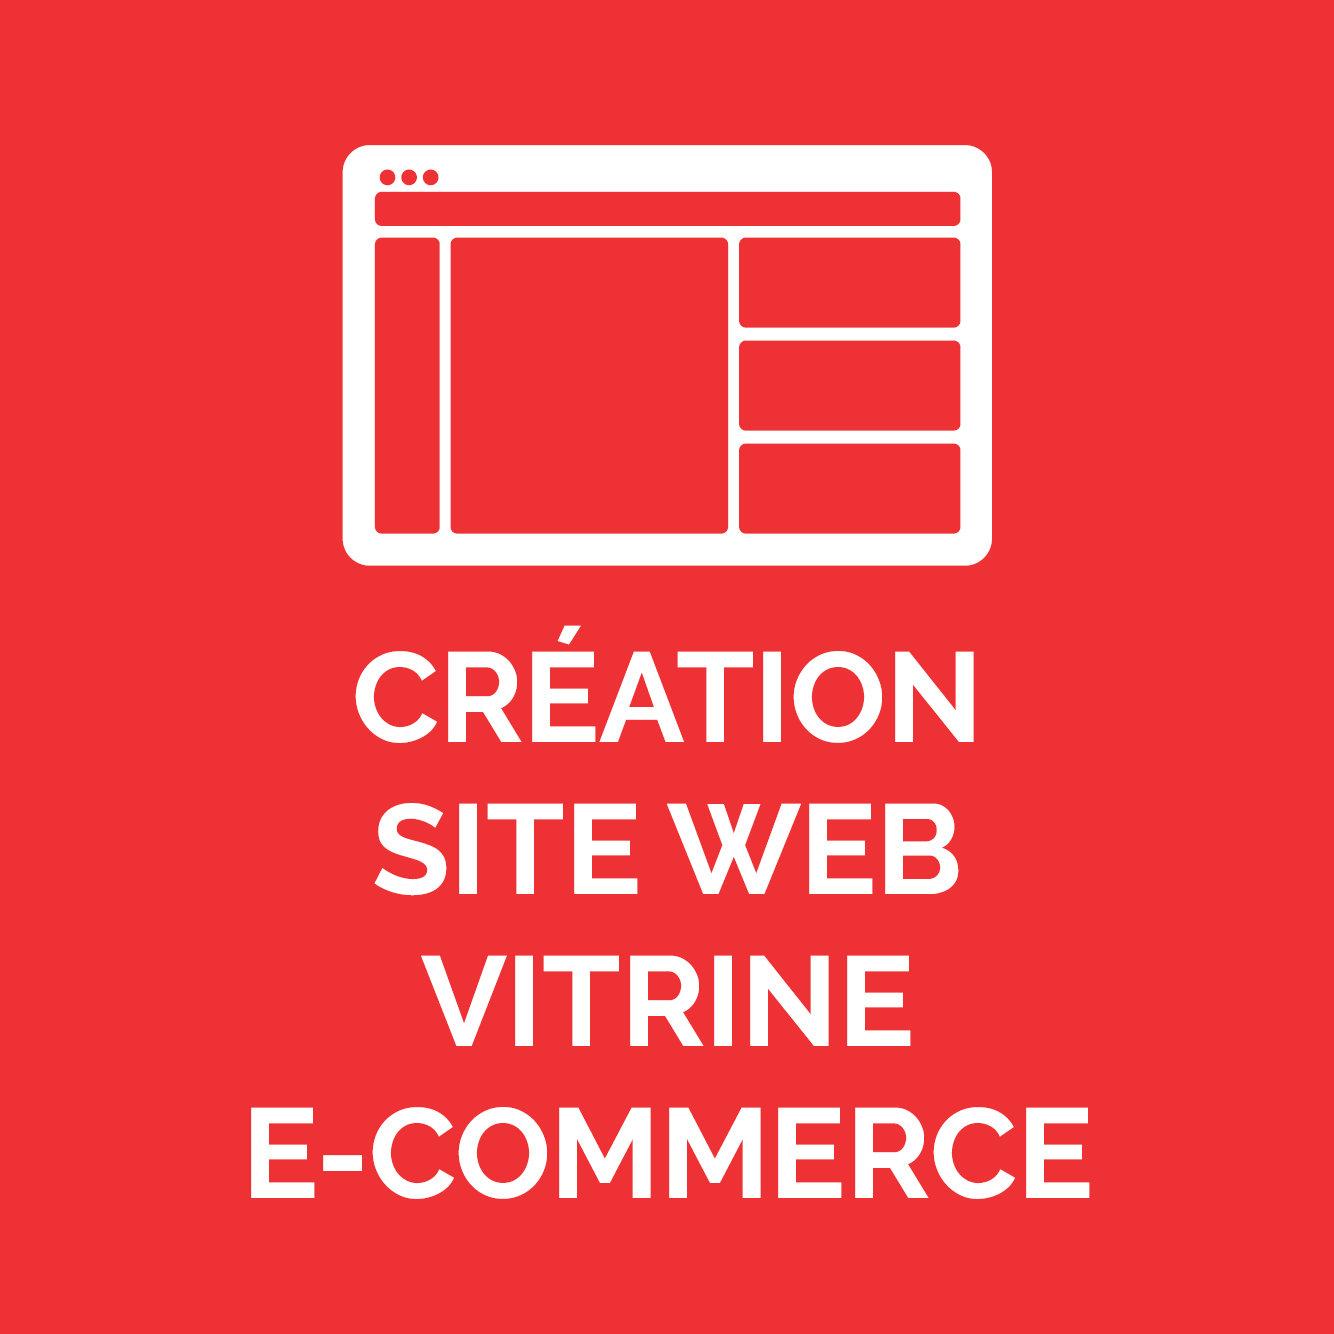 CREATION SITE WEB/ VITRINE E-COMMERCE